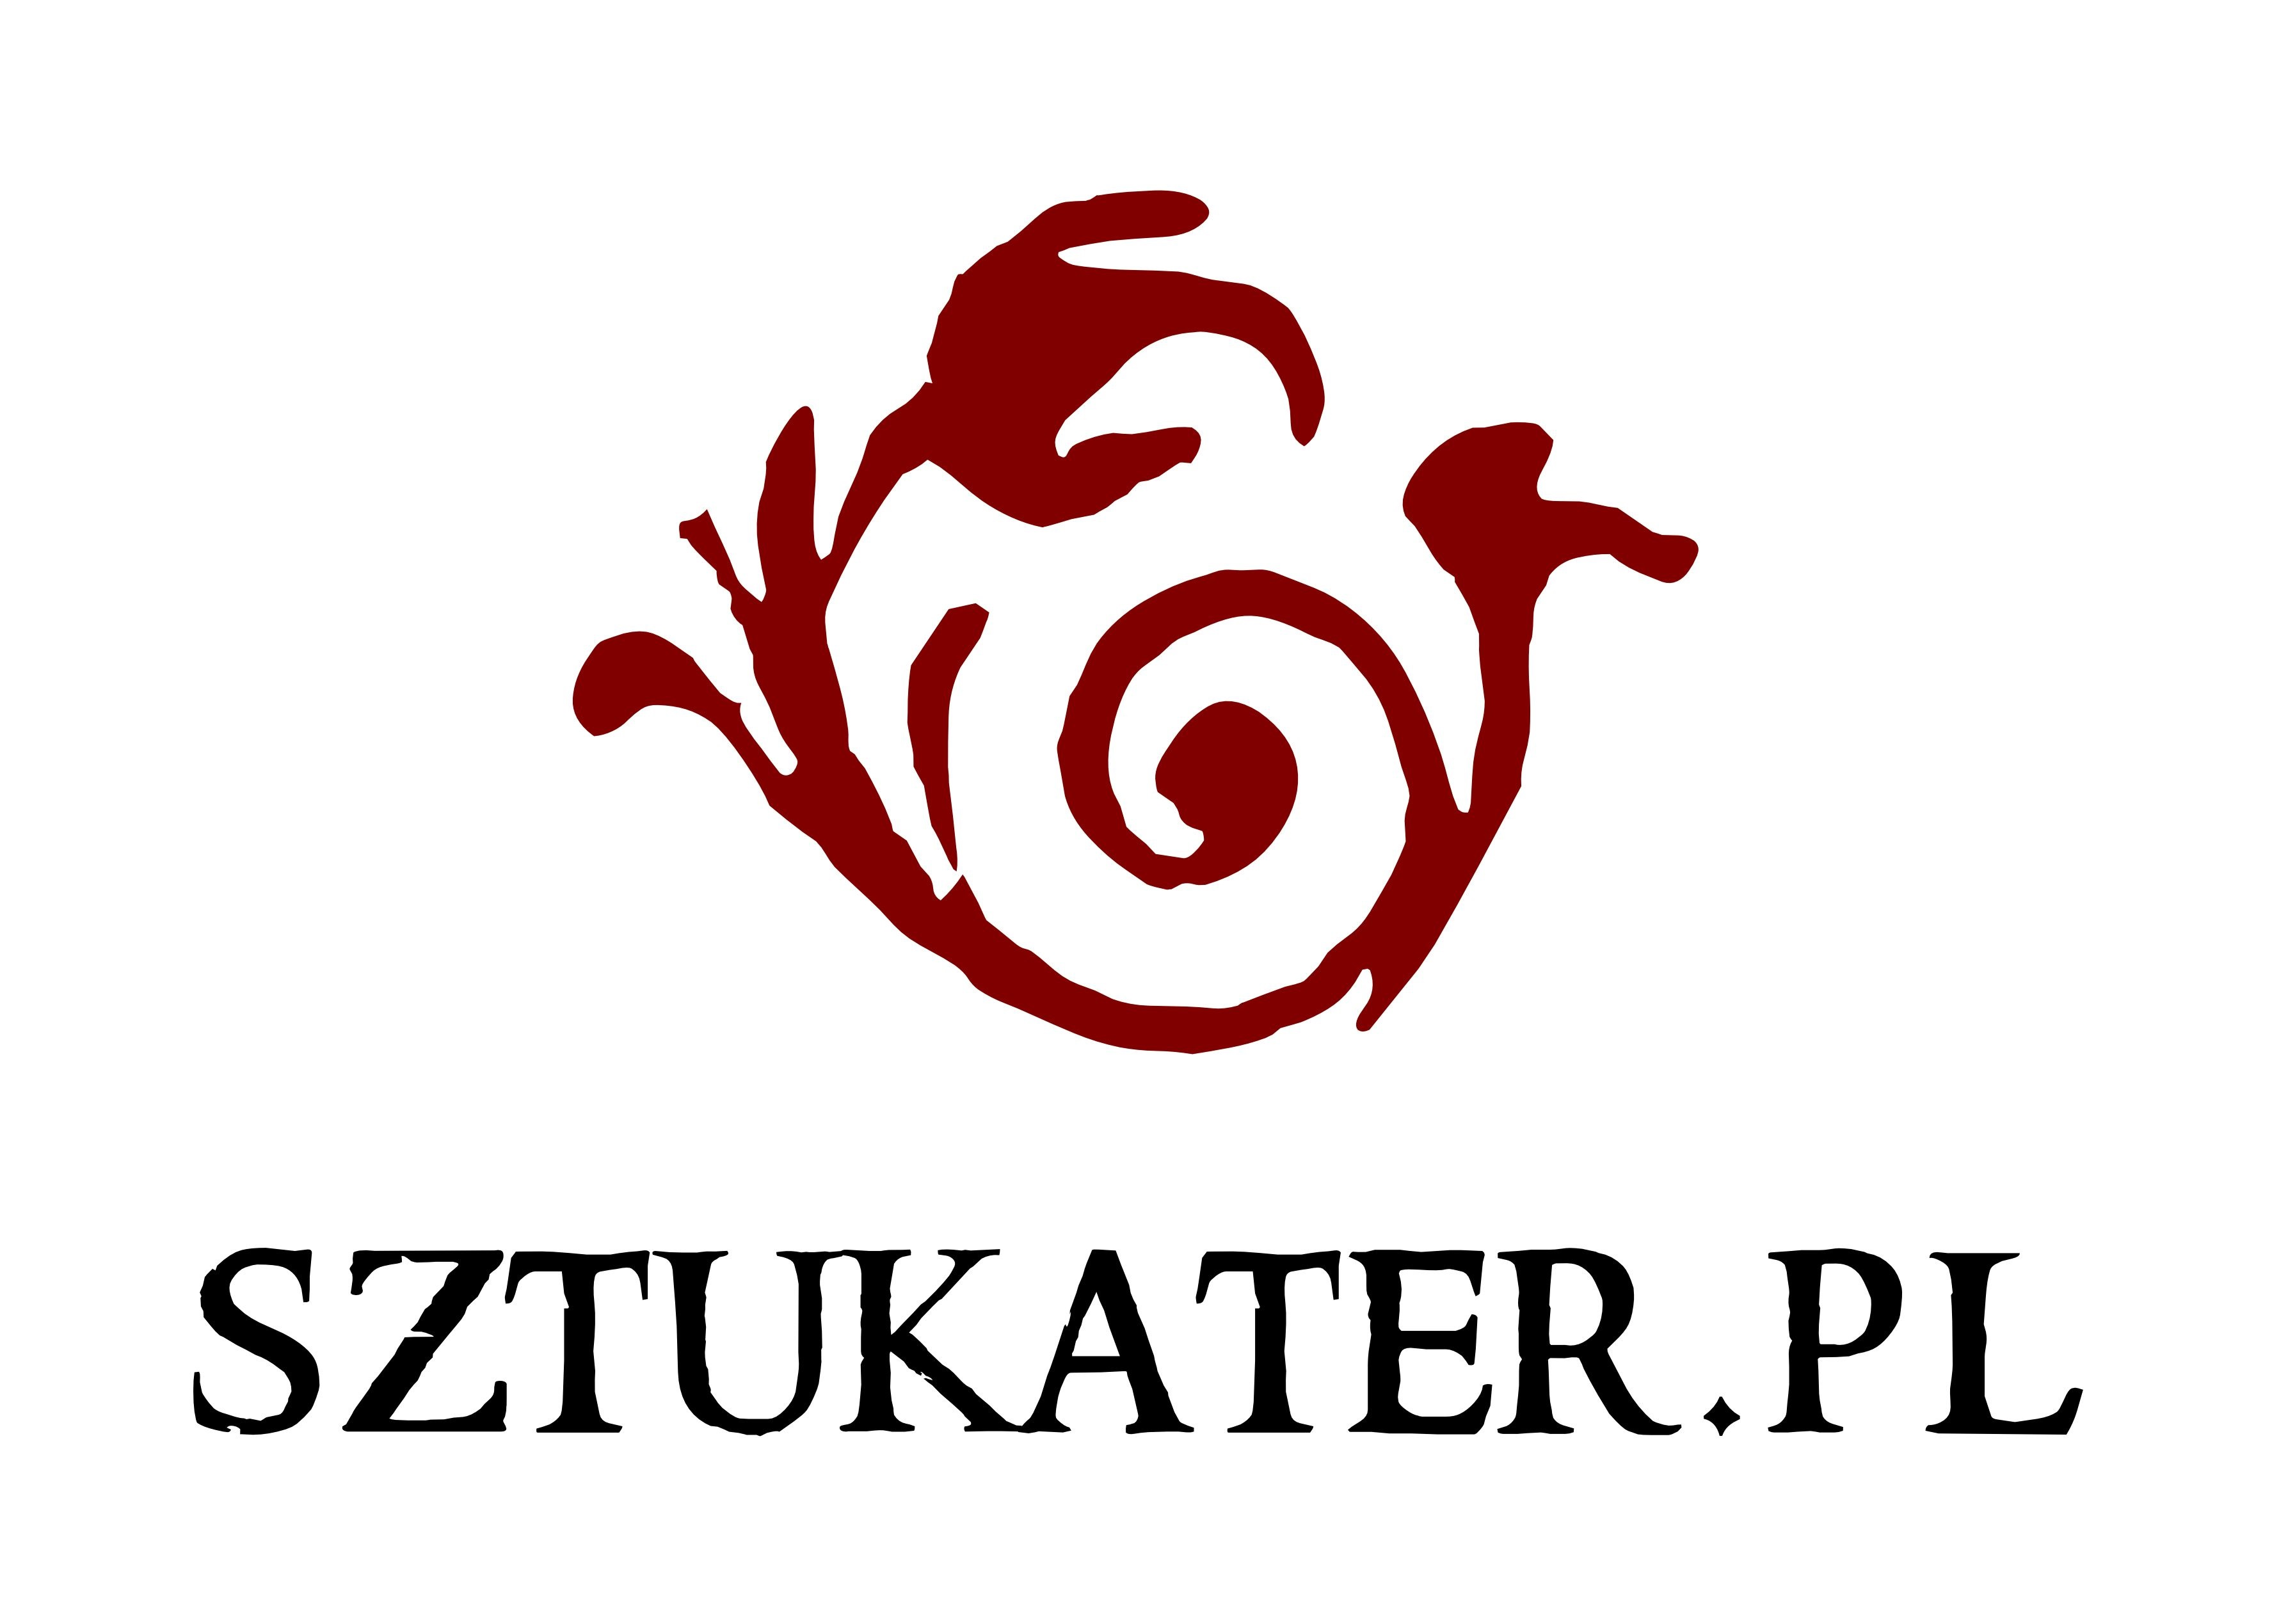 logo_Sztukater_Literatura Strzelin 2914